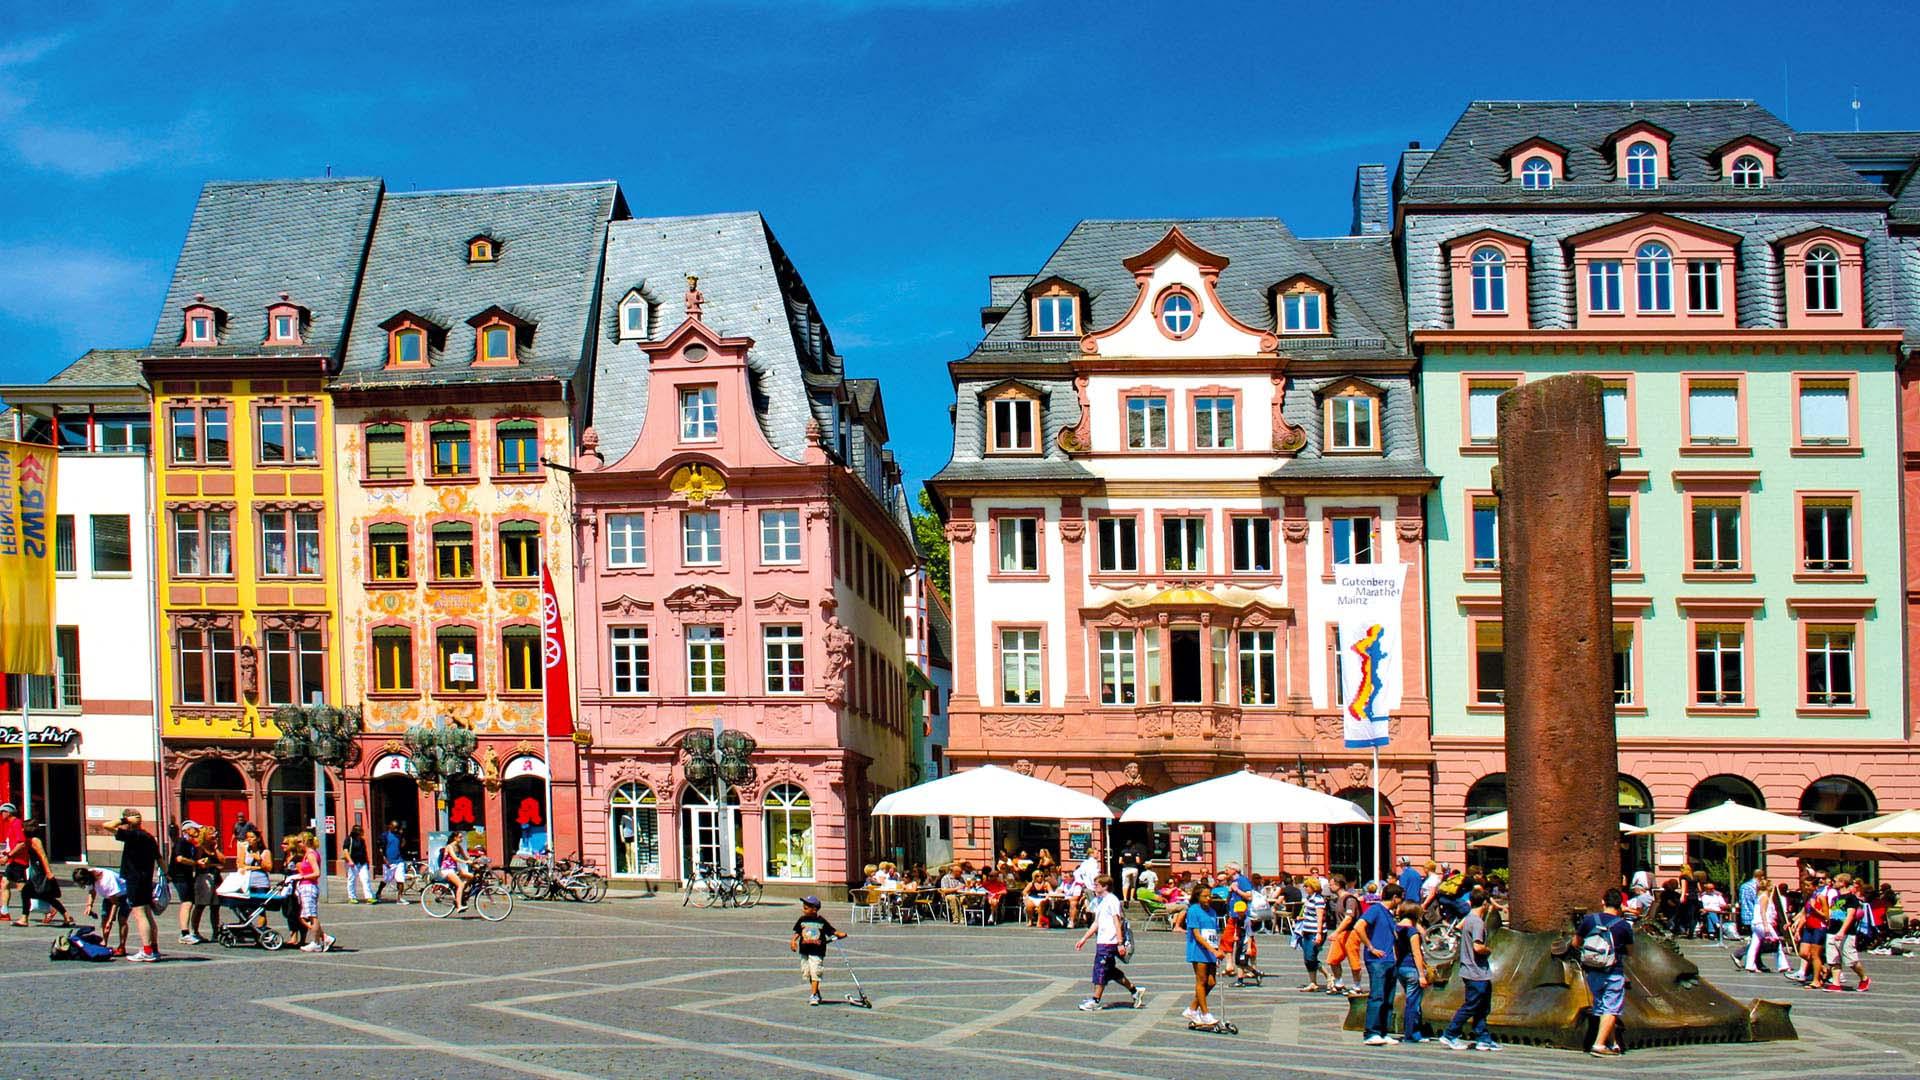 Marktplatz Mainz